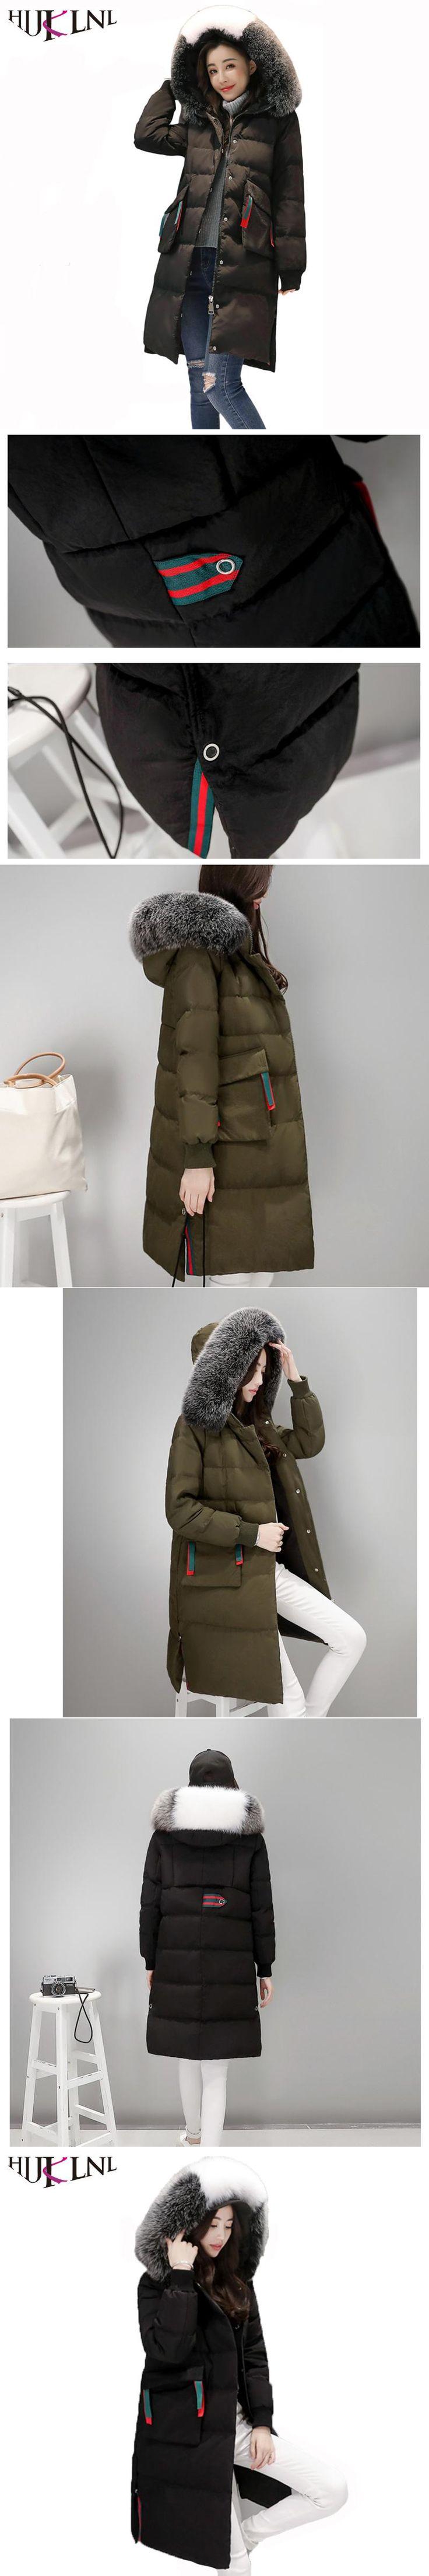 HIJKLNL 2017 Fashion Women Down Jacket Parka Winter Long Hood Fur Collar Feather Down Jacket Windbreaker camperas de pluma QN473